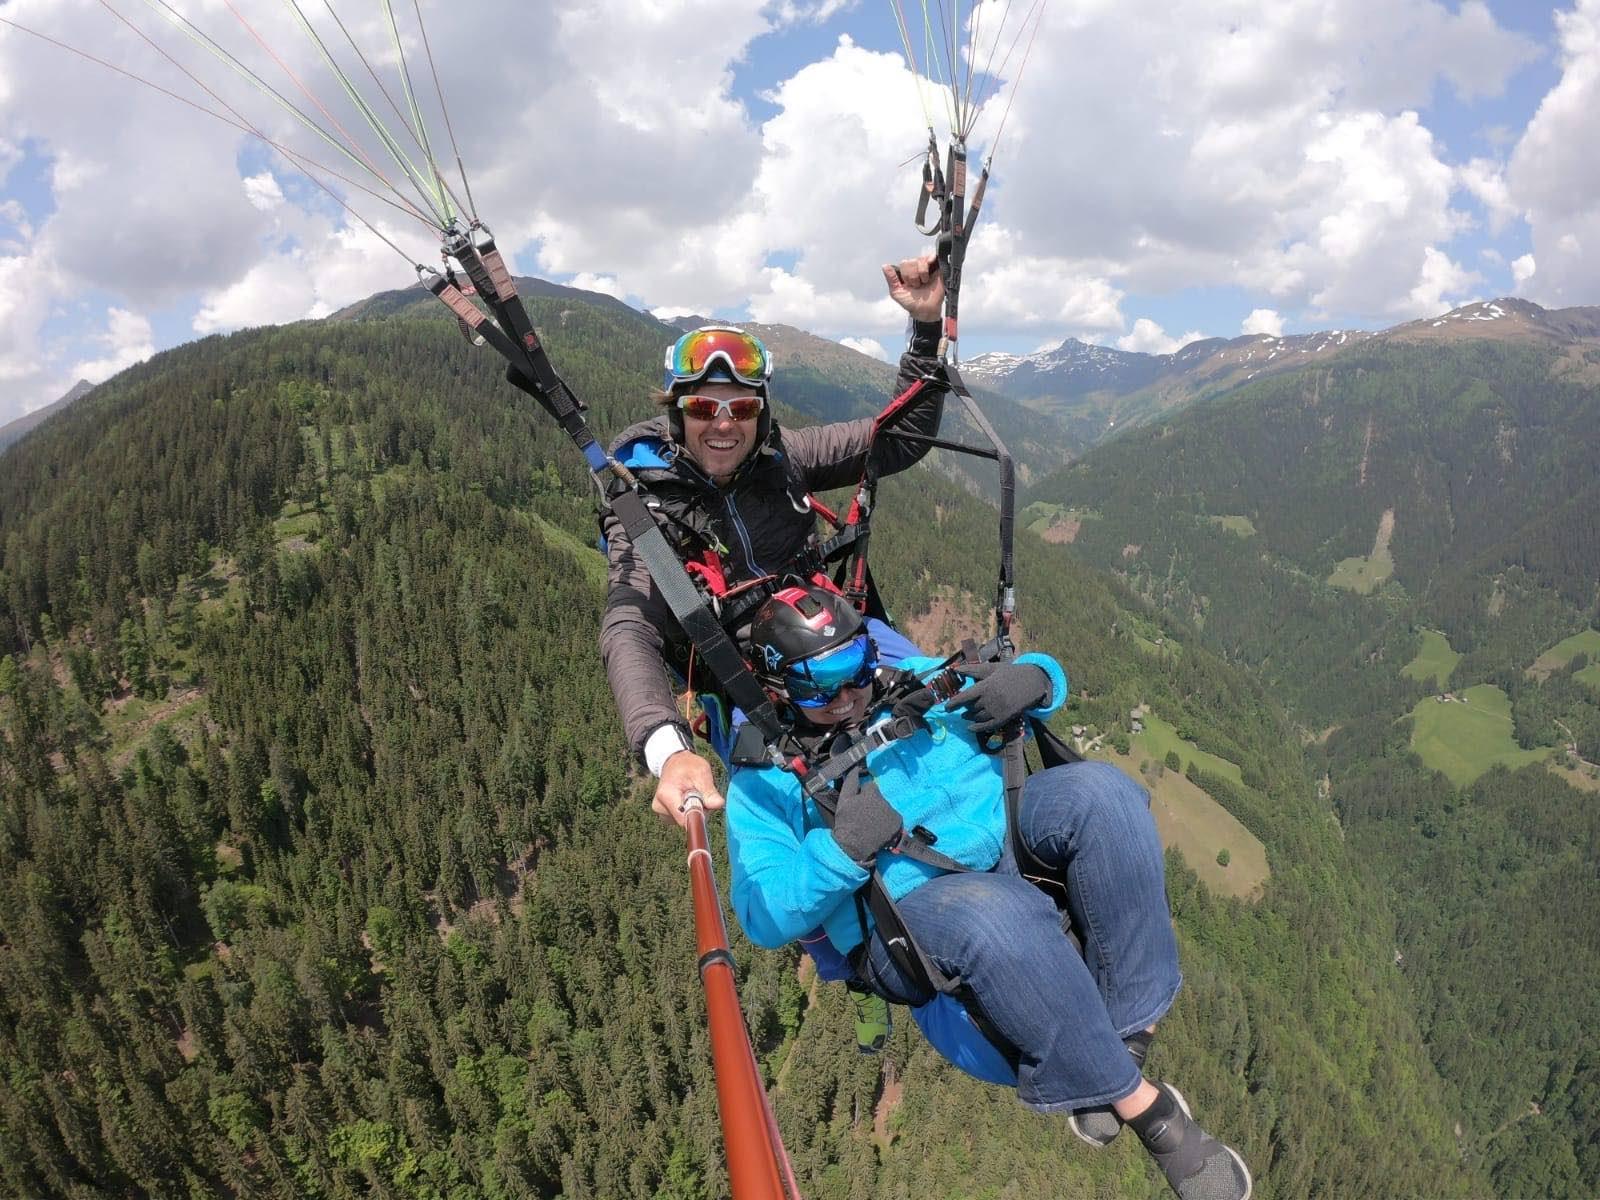 Paraglide with Airtime Austria, Lienz